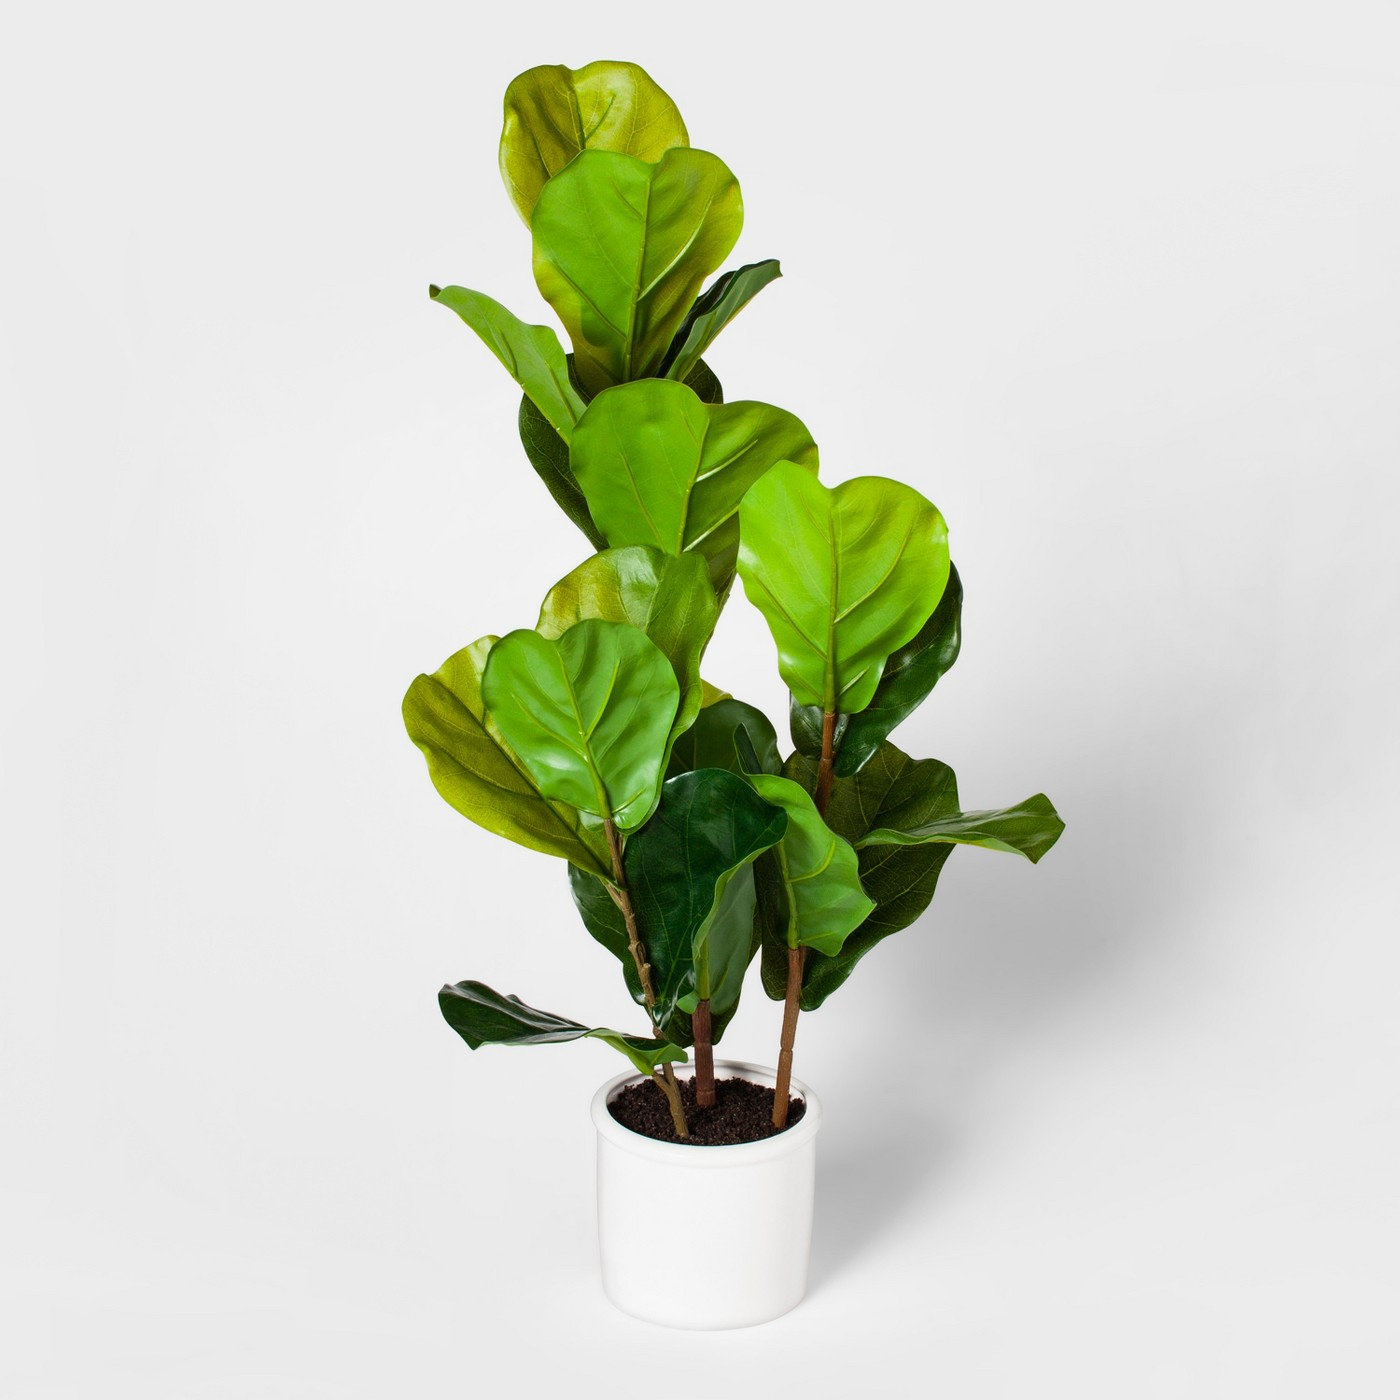 33%22 potted fiddle leaf fig tree .jpg